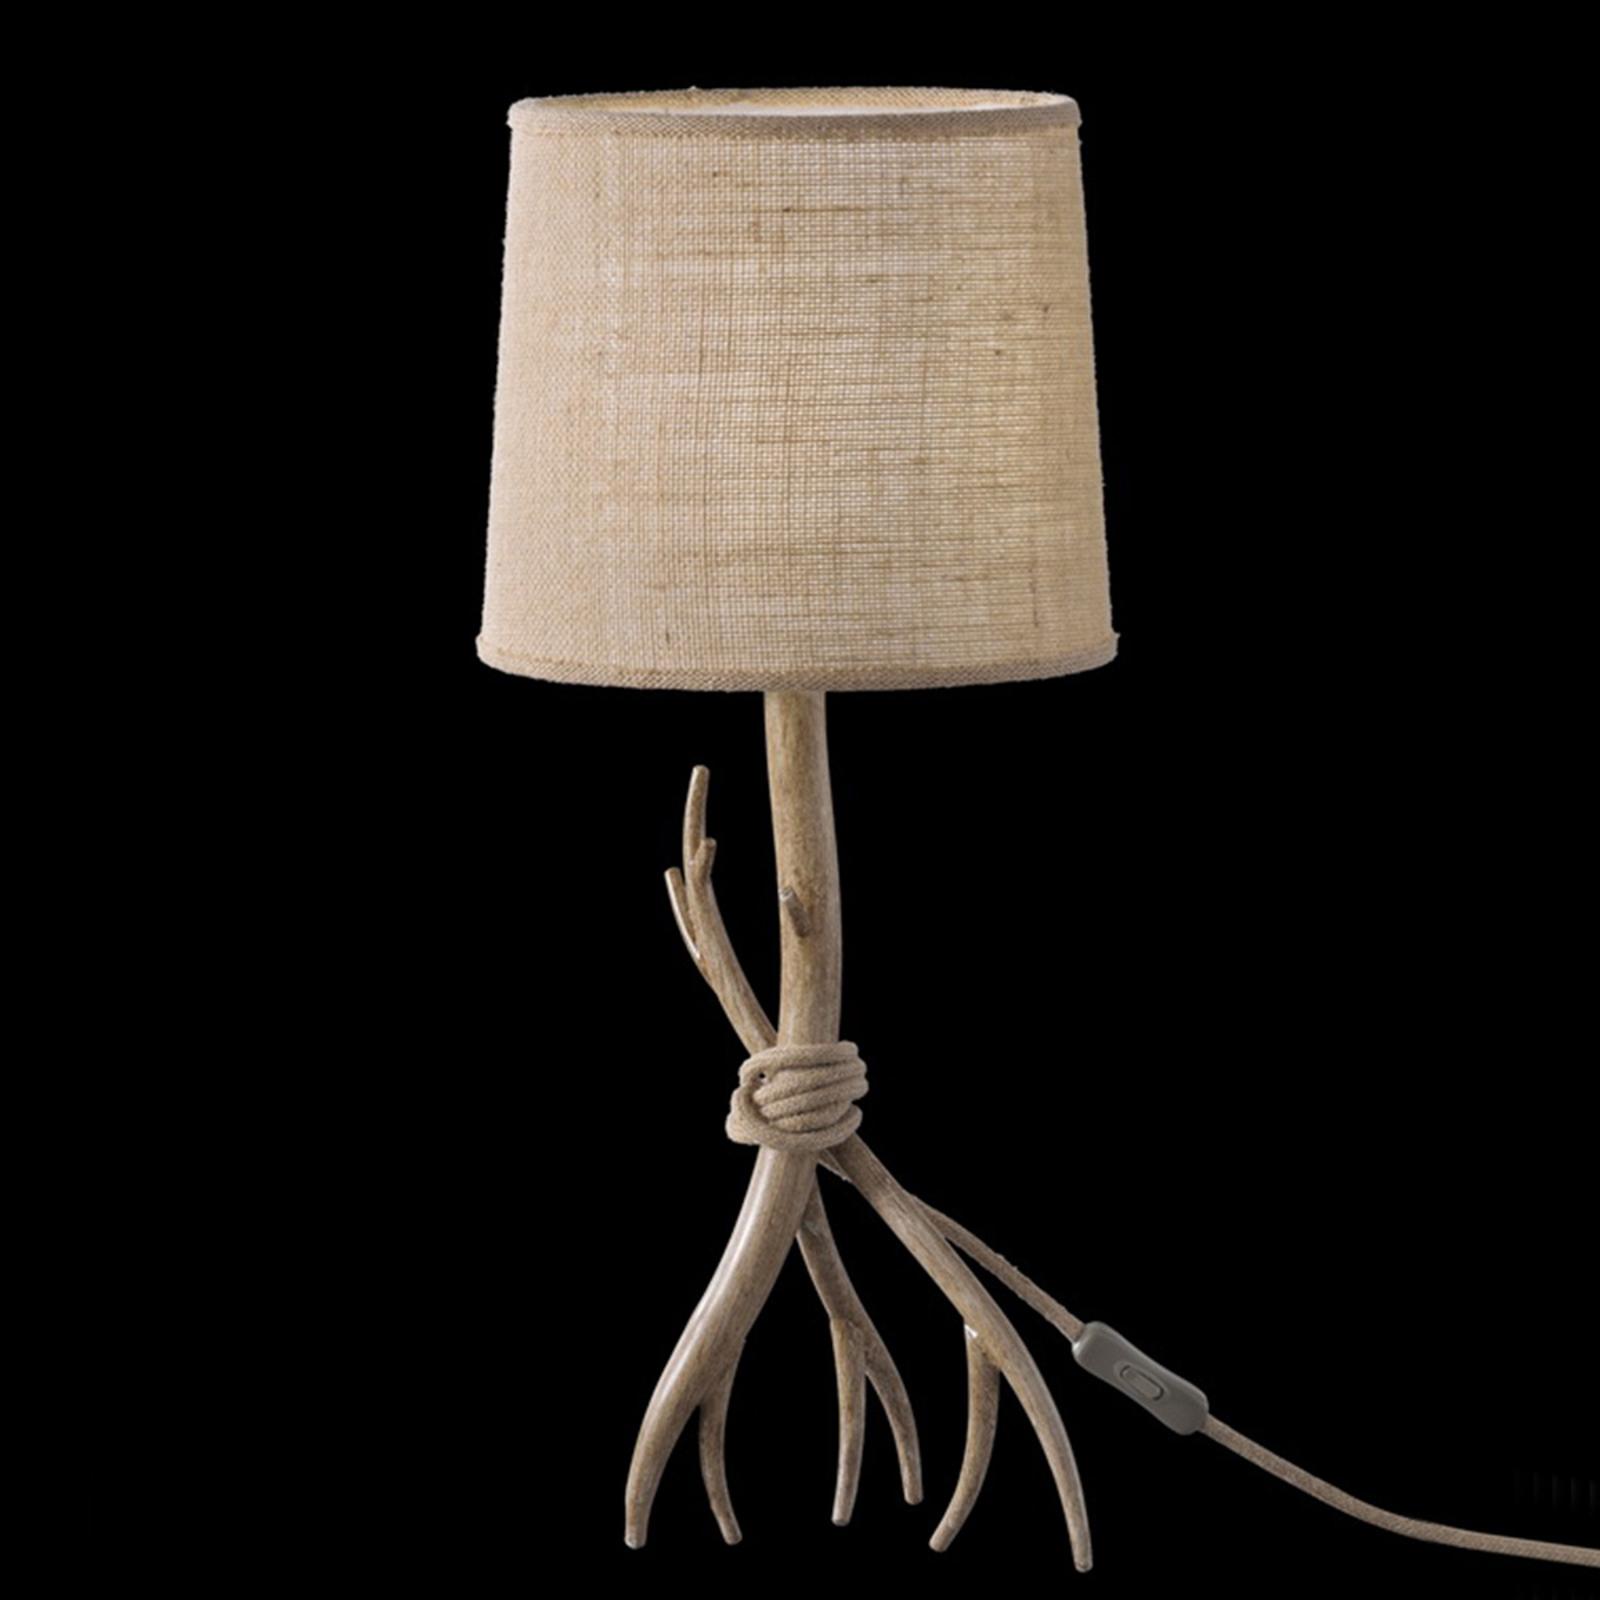 Lampe à poser Sabina avec abat-jour en tissu